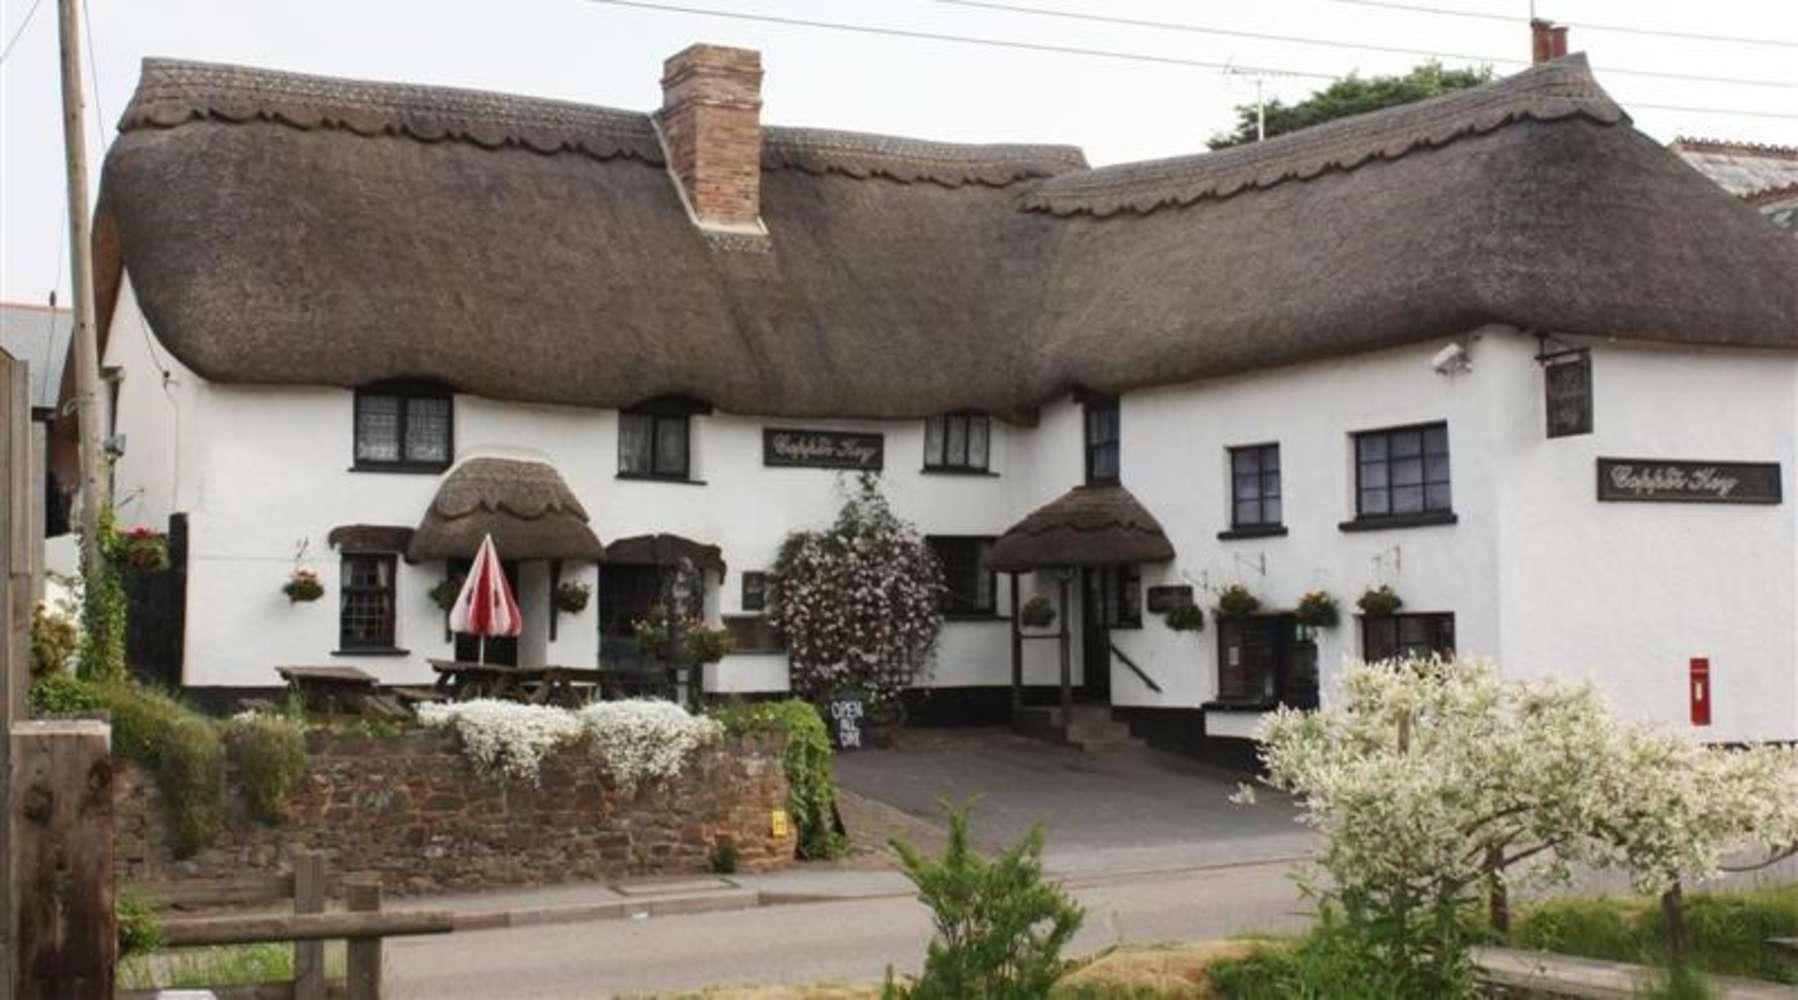 Pub North tawton, EX20 2ED - Copper Key Inn - 24868